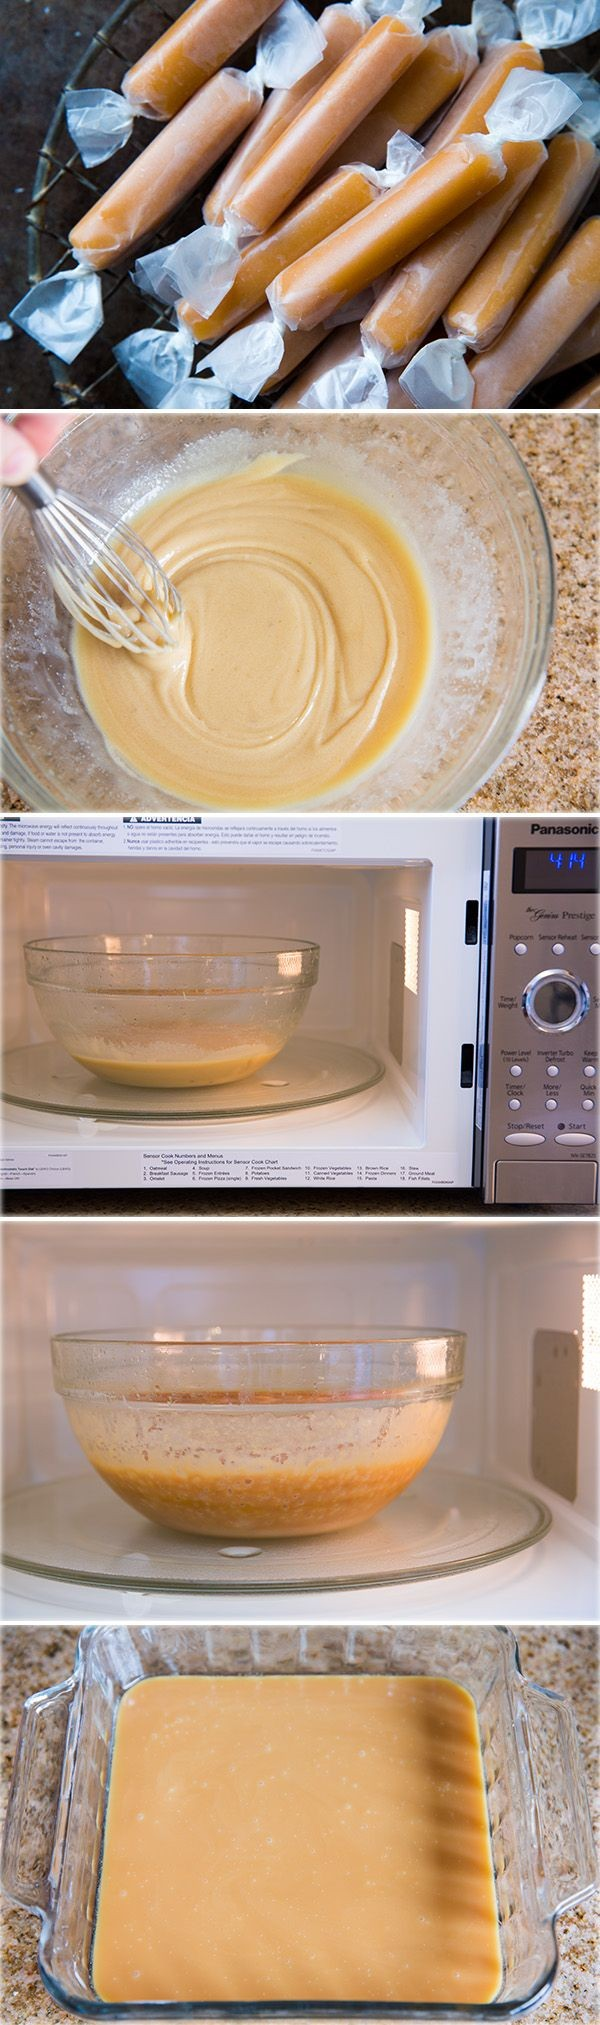 microwave-snacks3-600x2025